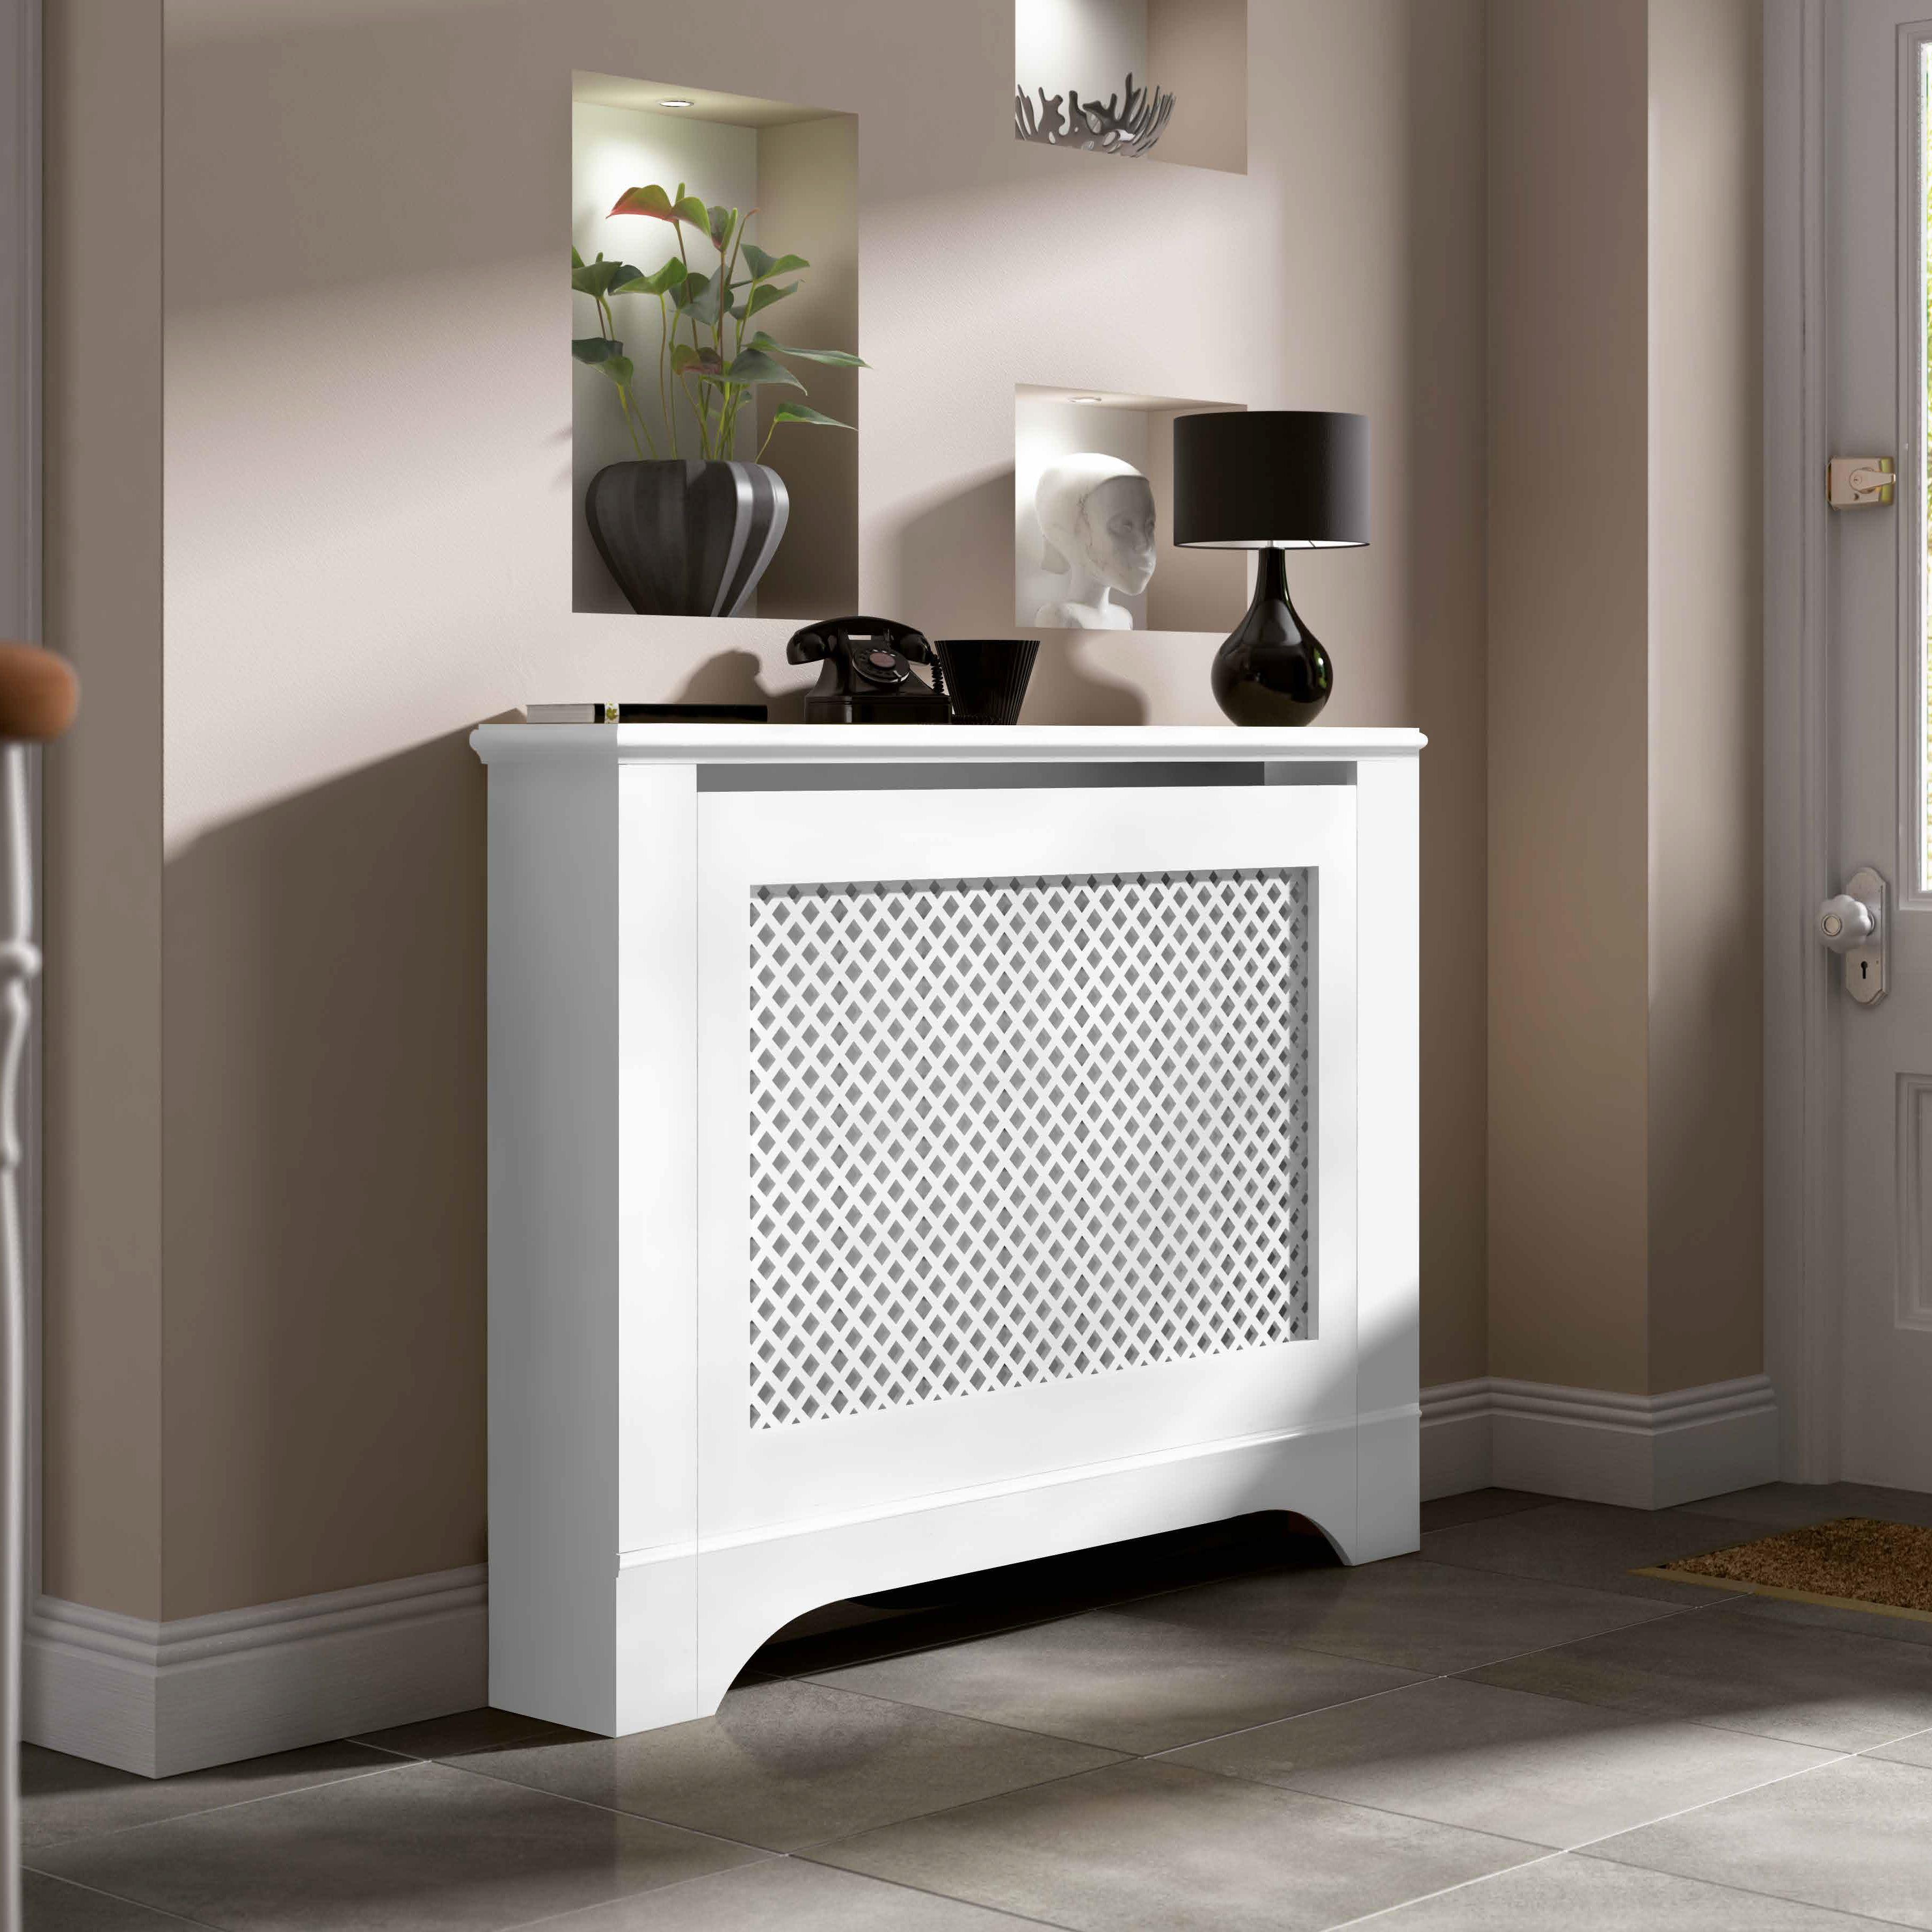 mayfair medium white painted radiator cover departments. Black Bedroom Furniture Sets. Home Design Ideas